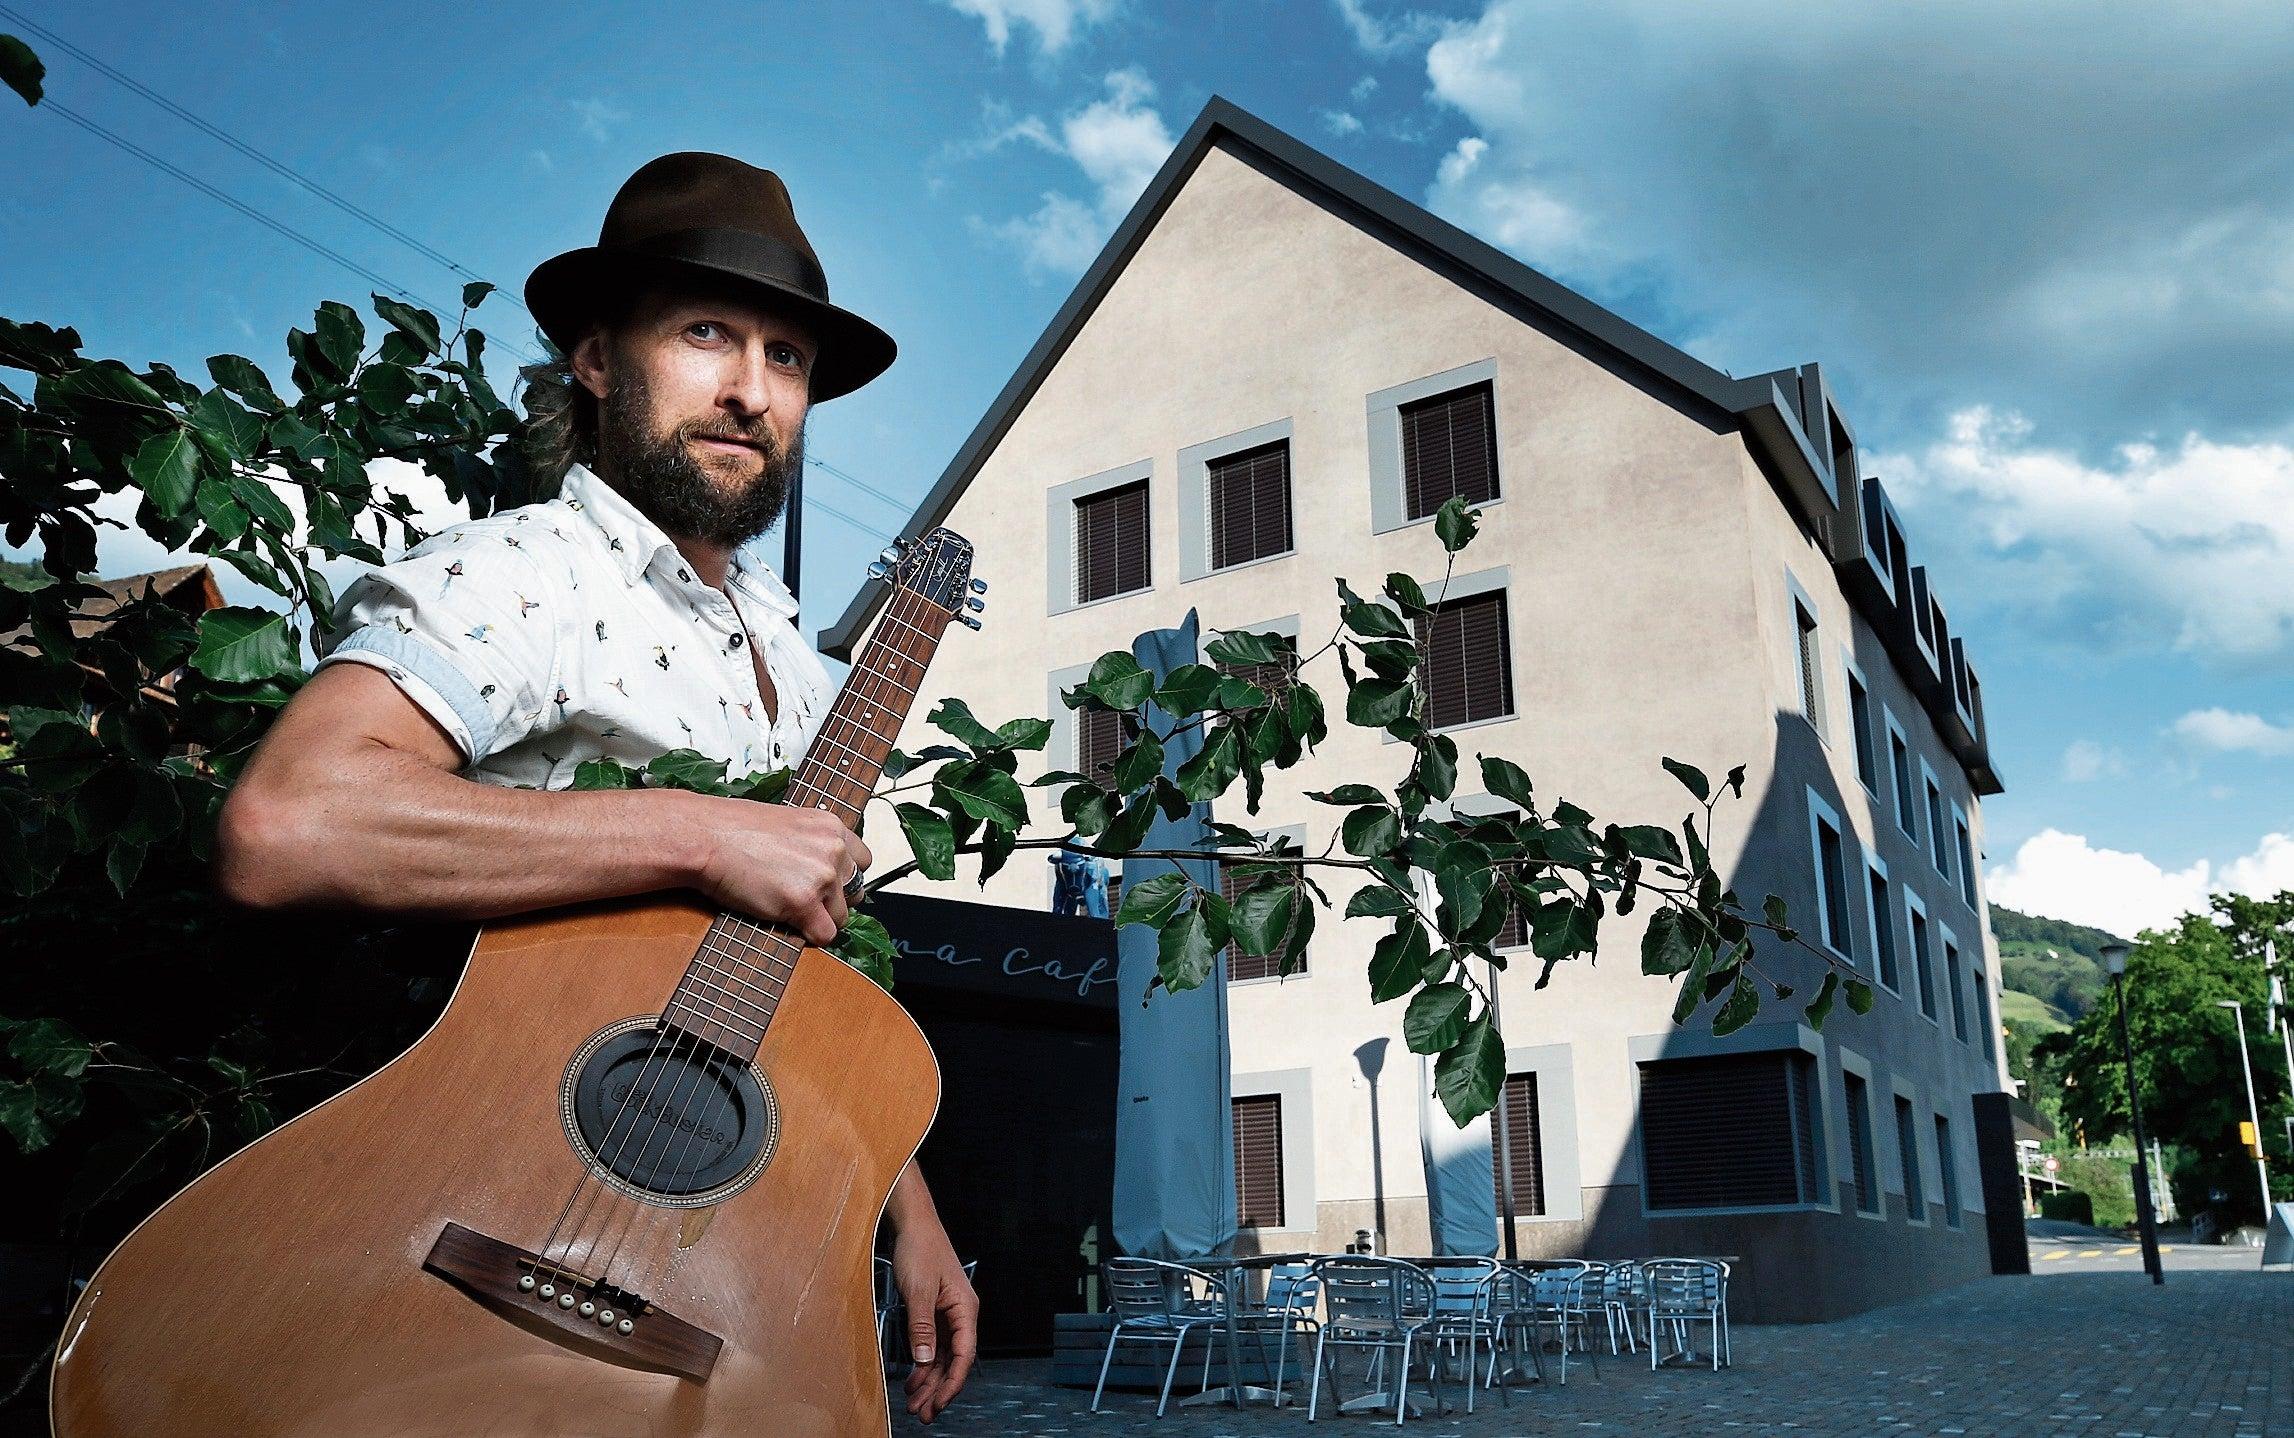 Mbliertes Wohnobjekt mieten in Kanton Zug | shopwitease.com